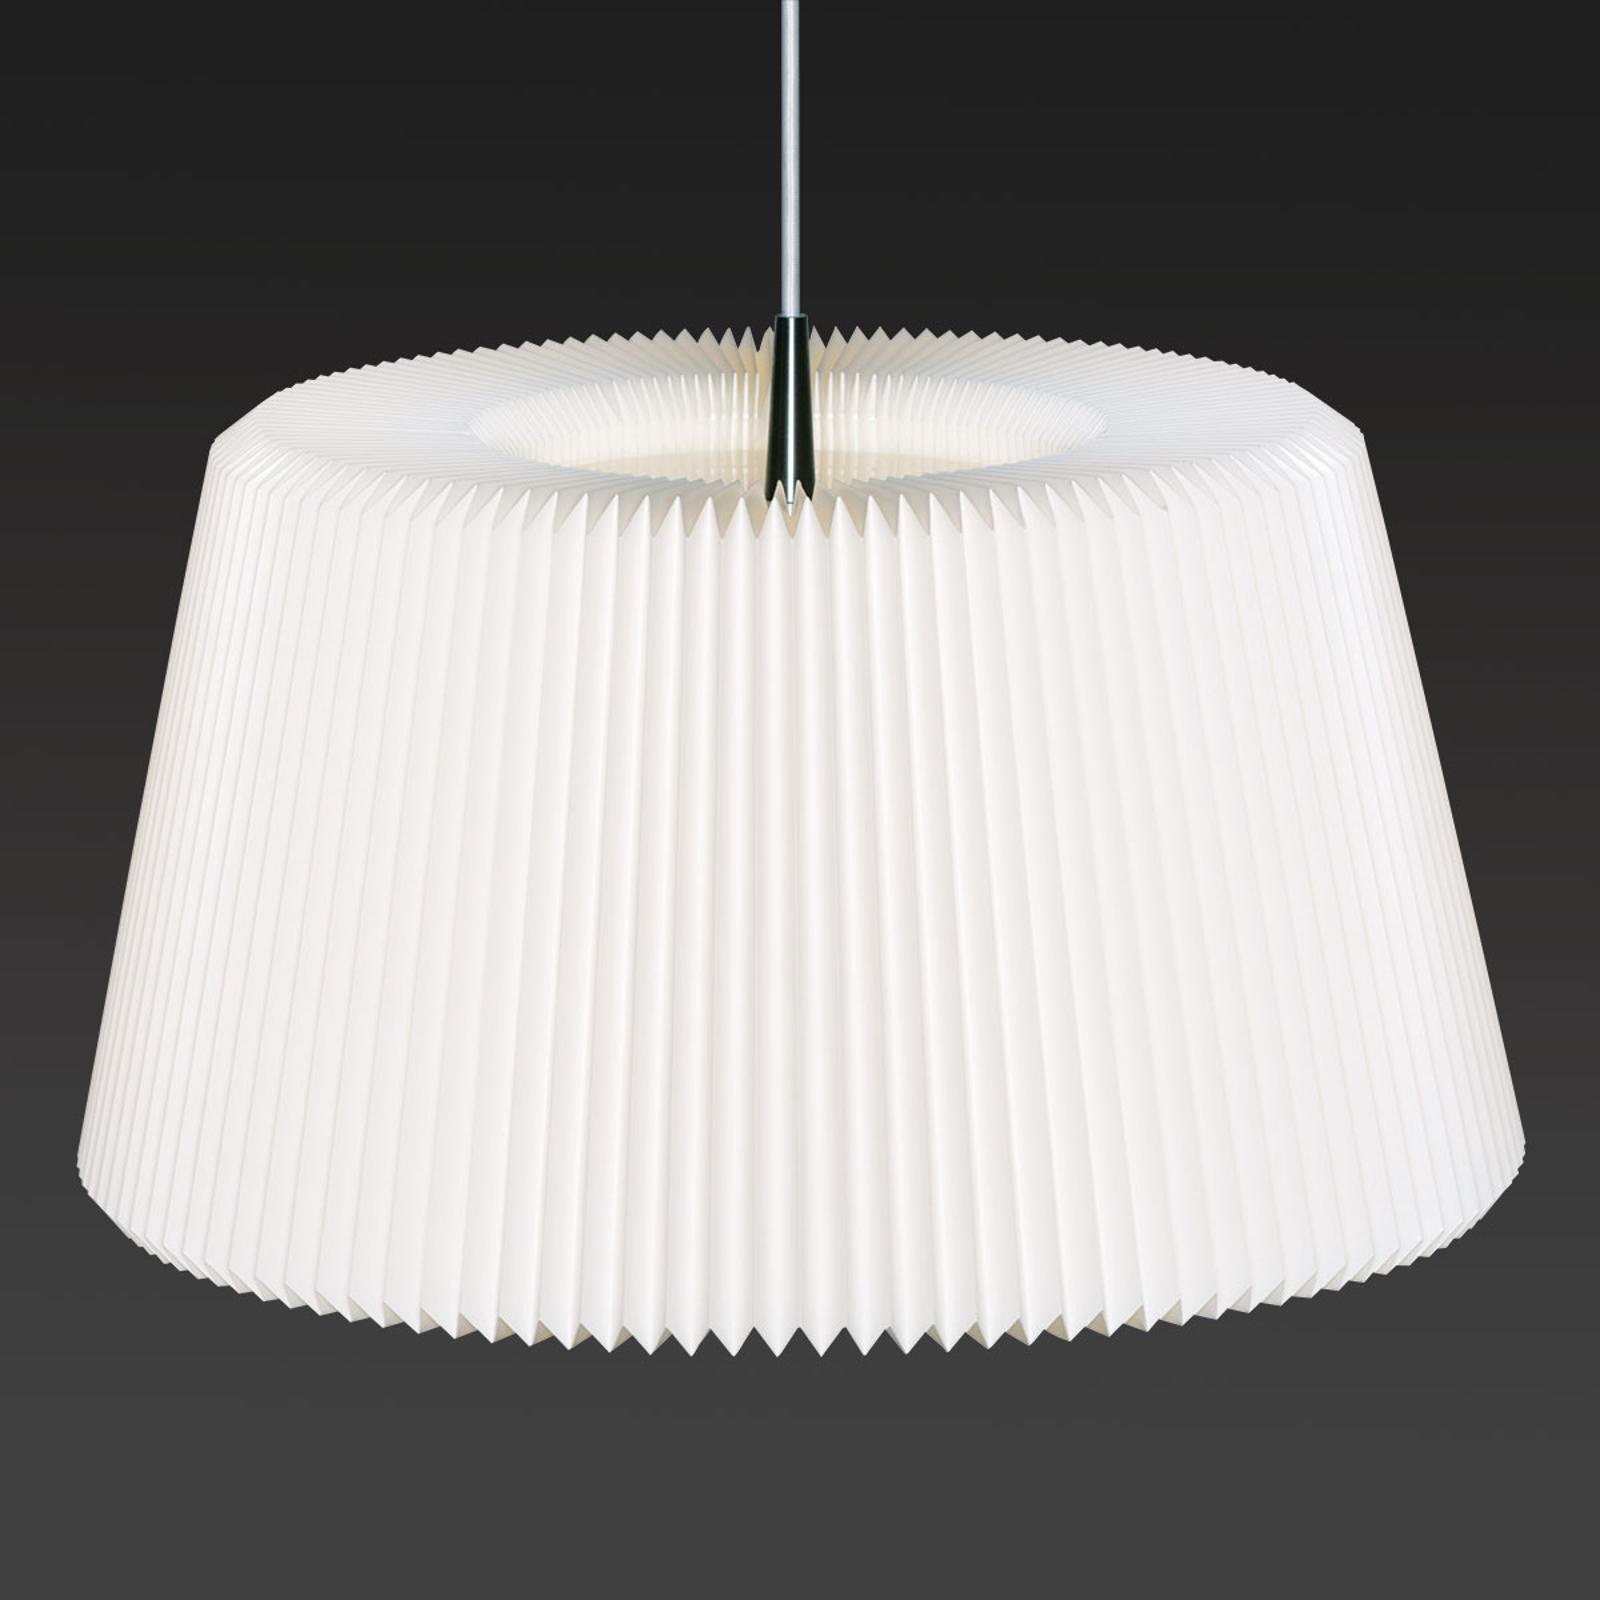 LE KLINT Snowdrop XL - závěsné světlo z plastu